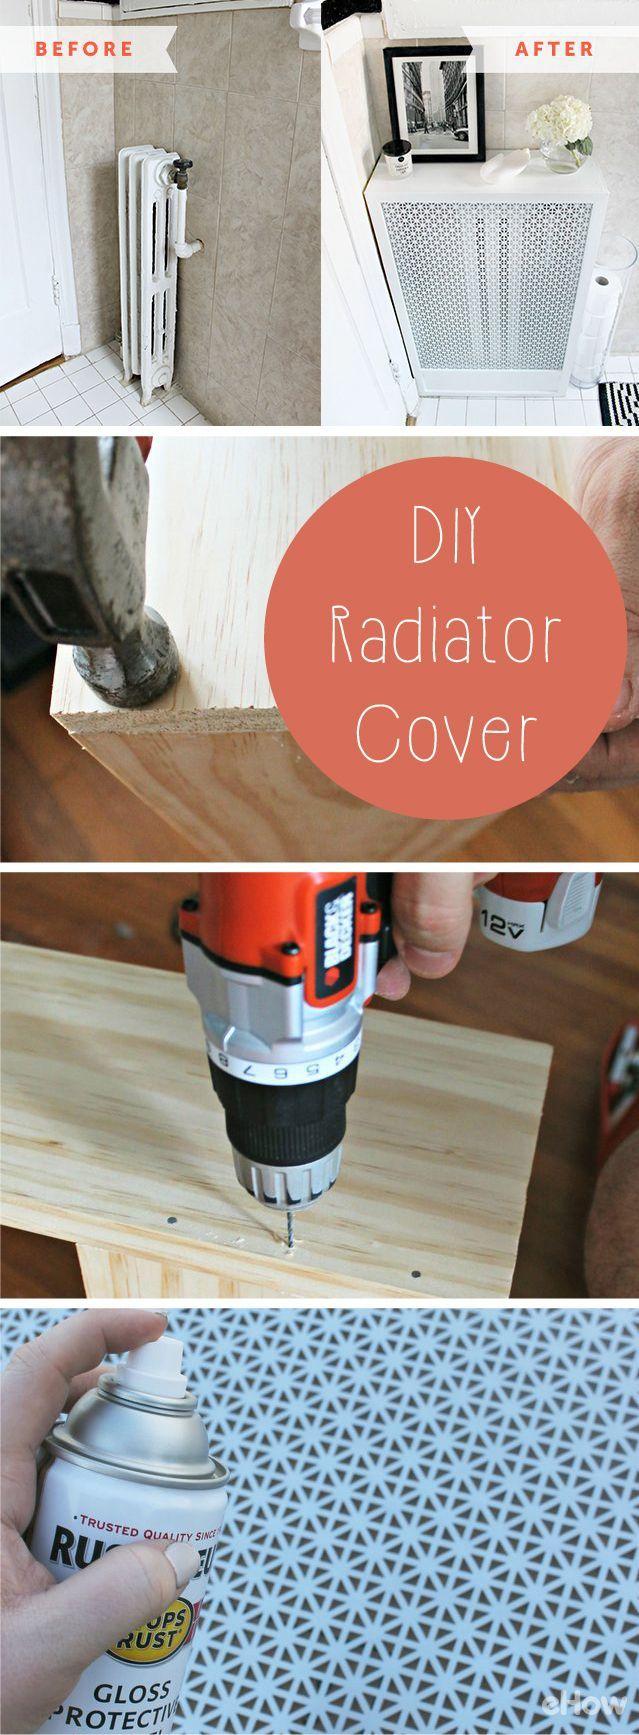 How to Build a Radiator Cover | Heizung, Heizkörper und Heizung ...